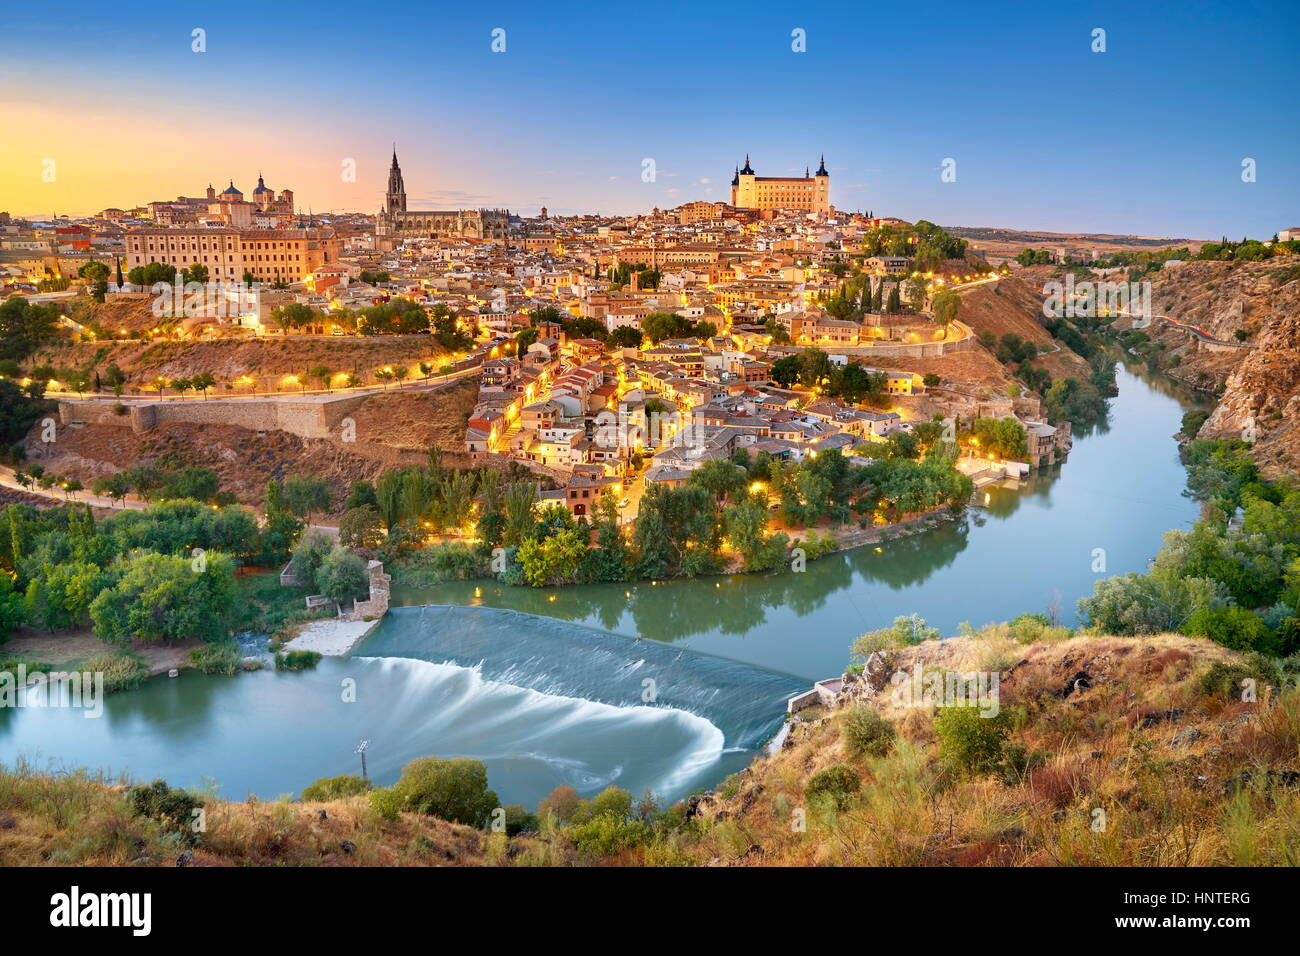 Toledo - old town skyline, Spain - Stock Image